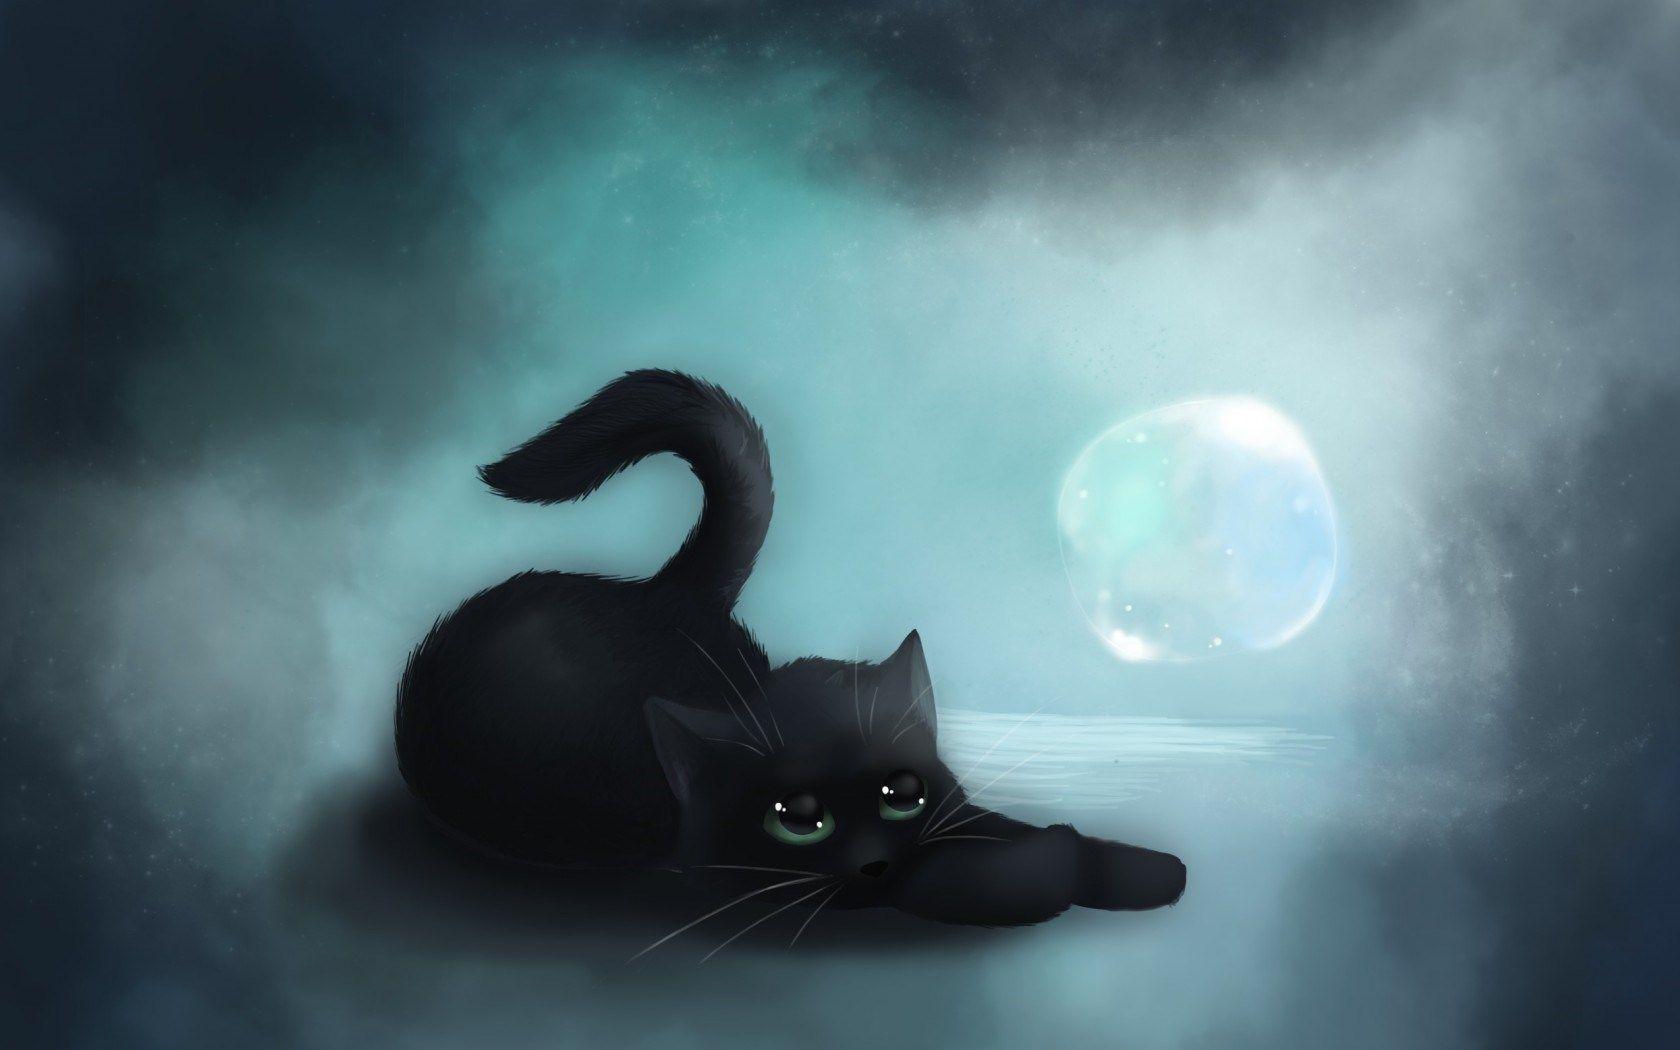 Artwork Black Kitten Hd Wallpaper Omwallpapers Black Cat Art Cat Wallpaper Cat Art